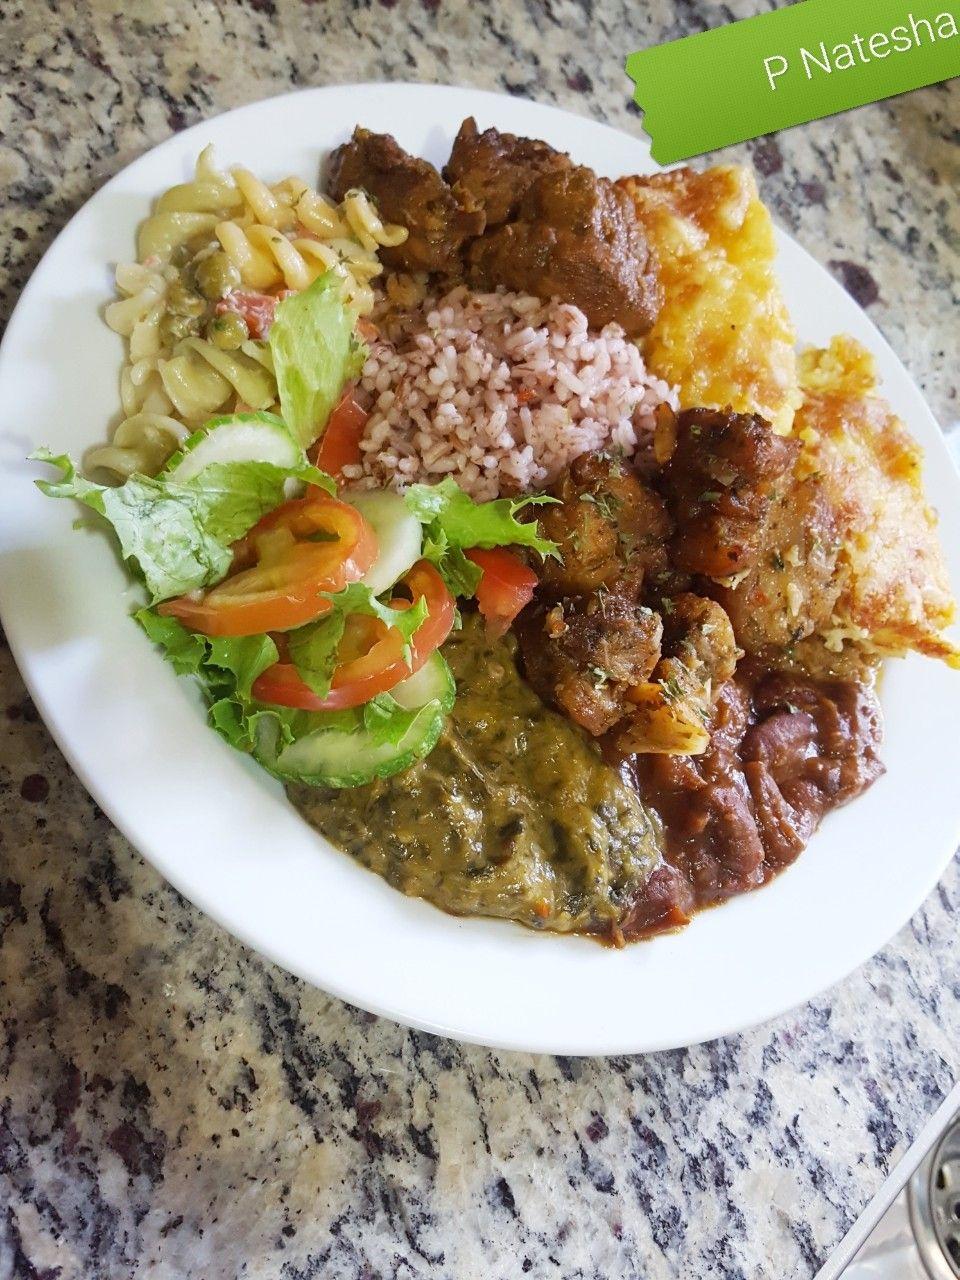 Creole Rice Shepherds Pie Callaloo Red Beans Stewed Chicken Garlic Pork Macaroni Salad And Fresh Salad Caribbean T Trinidad Recipes Food Creole Rice